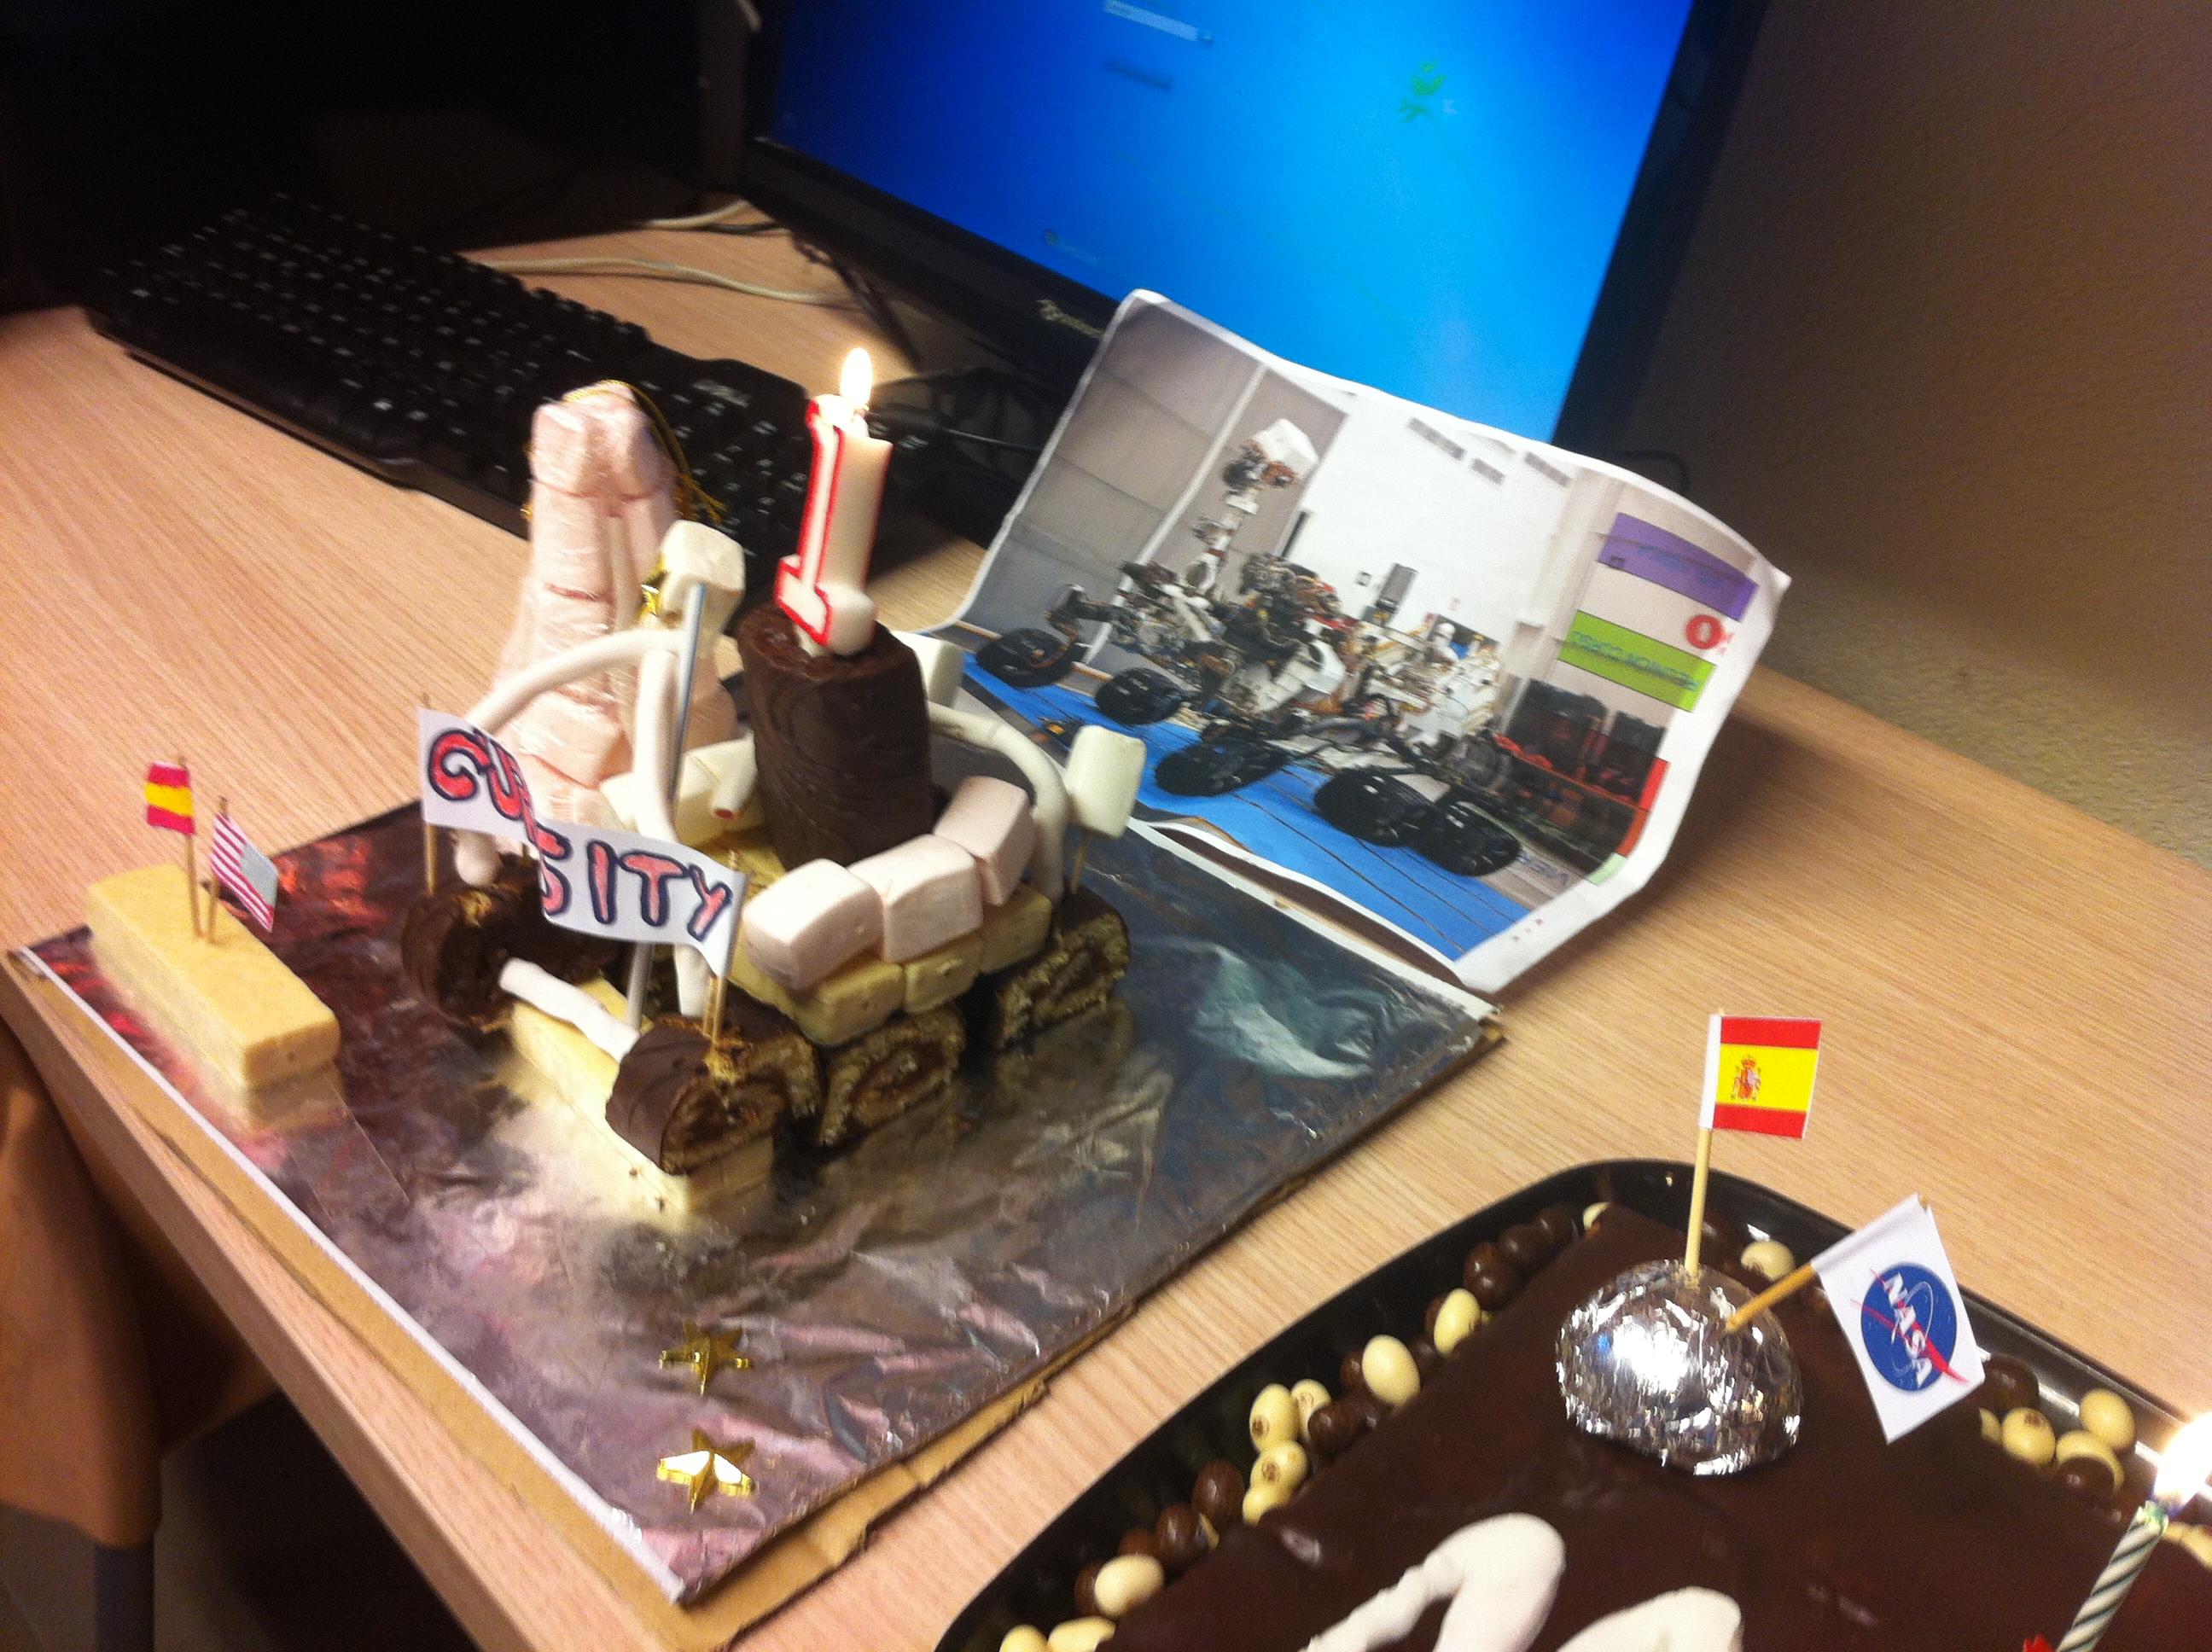 Curiosity Laboratory Aniversary